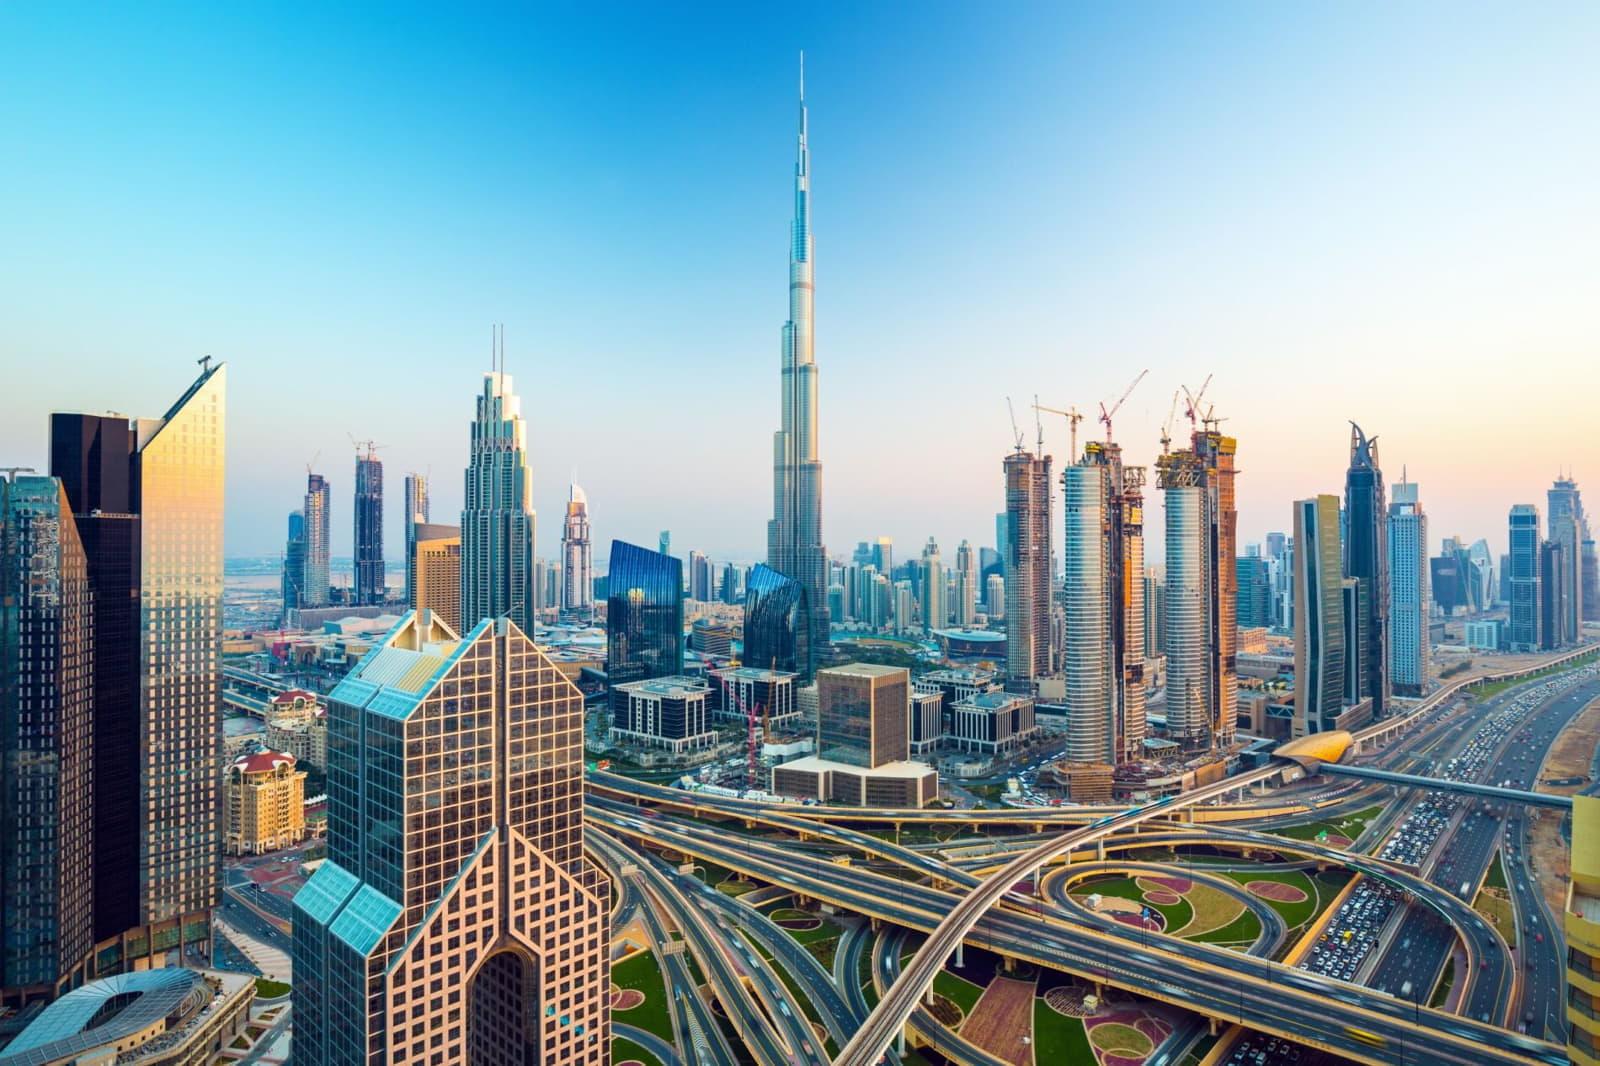 Burj Khalifa Ντουμπάι - Συντριβάνια στο Ντουμπάι -Love your holidays